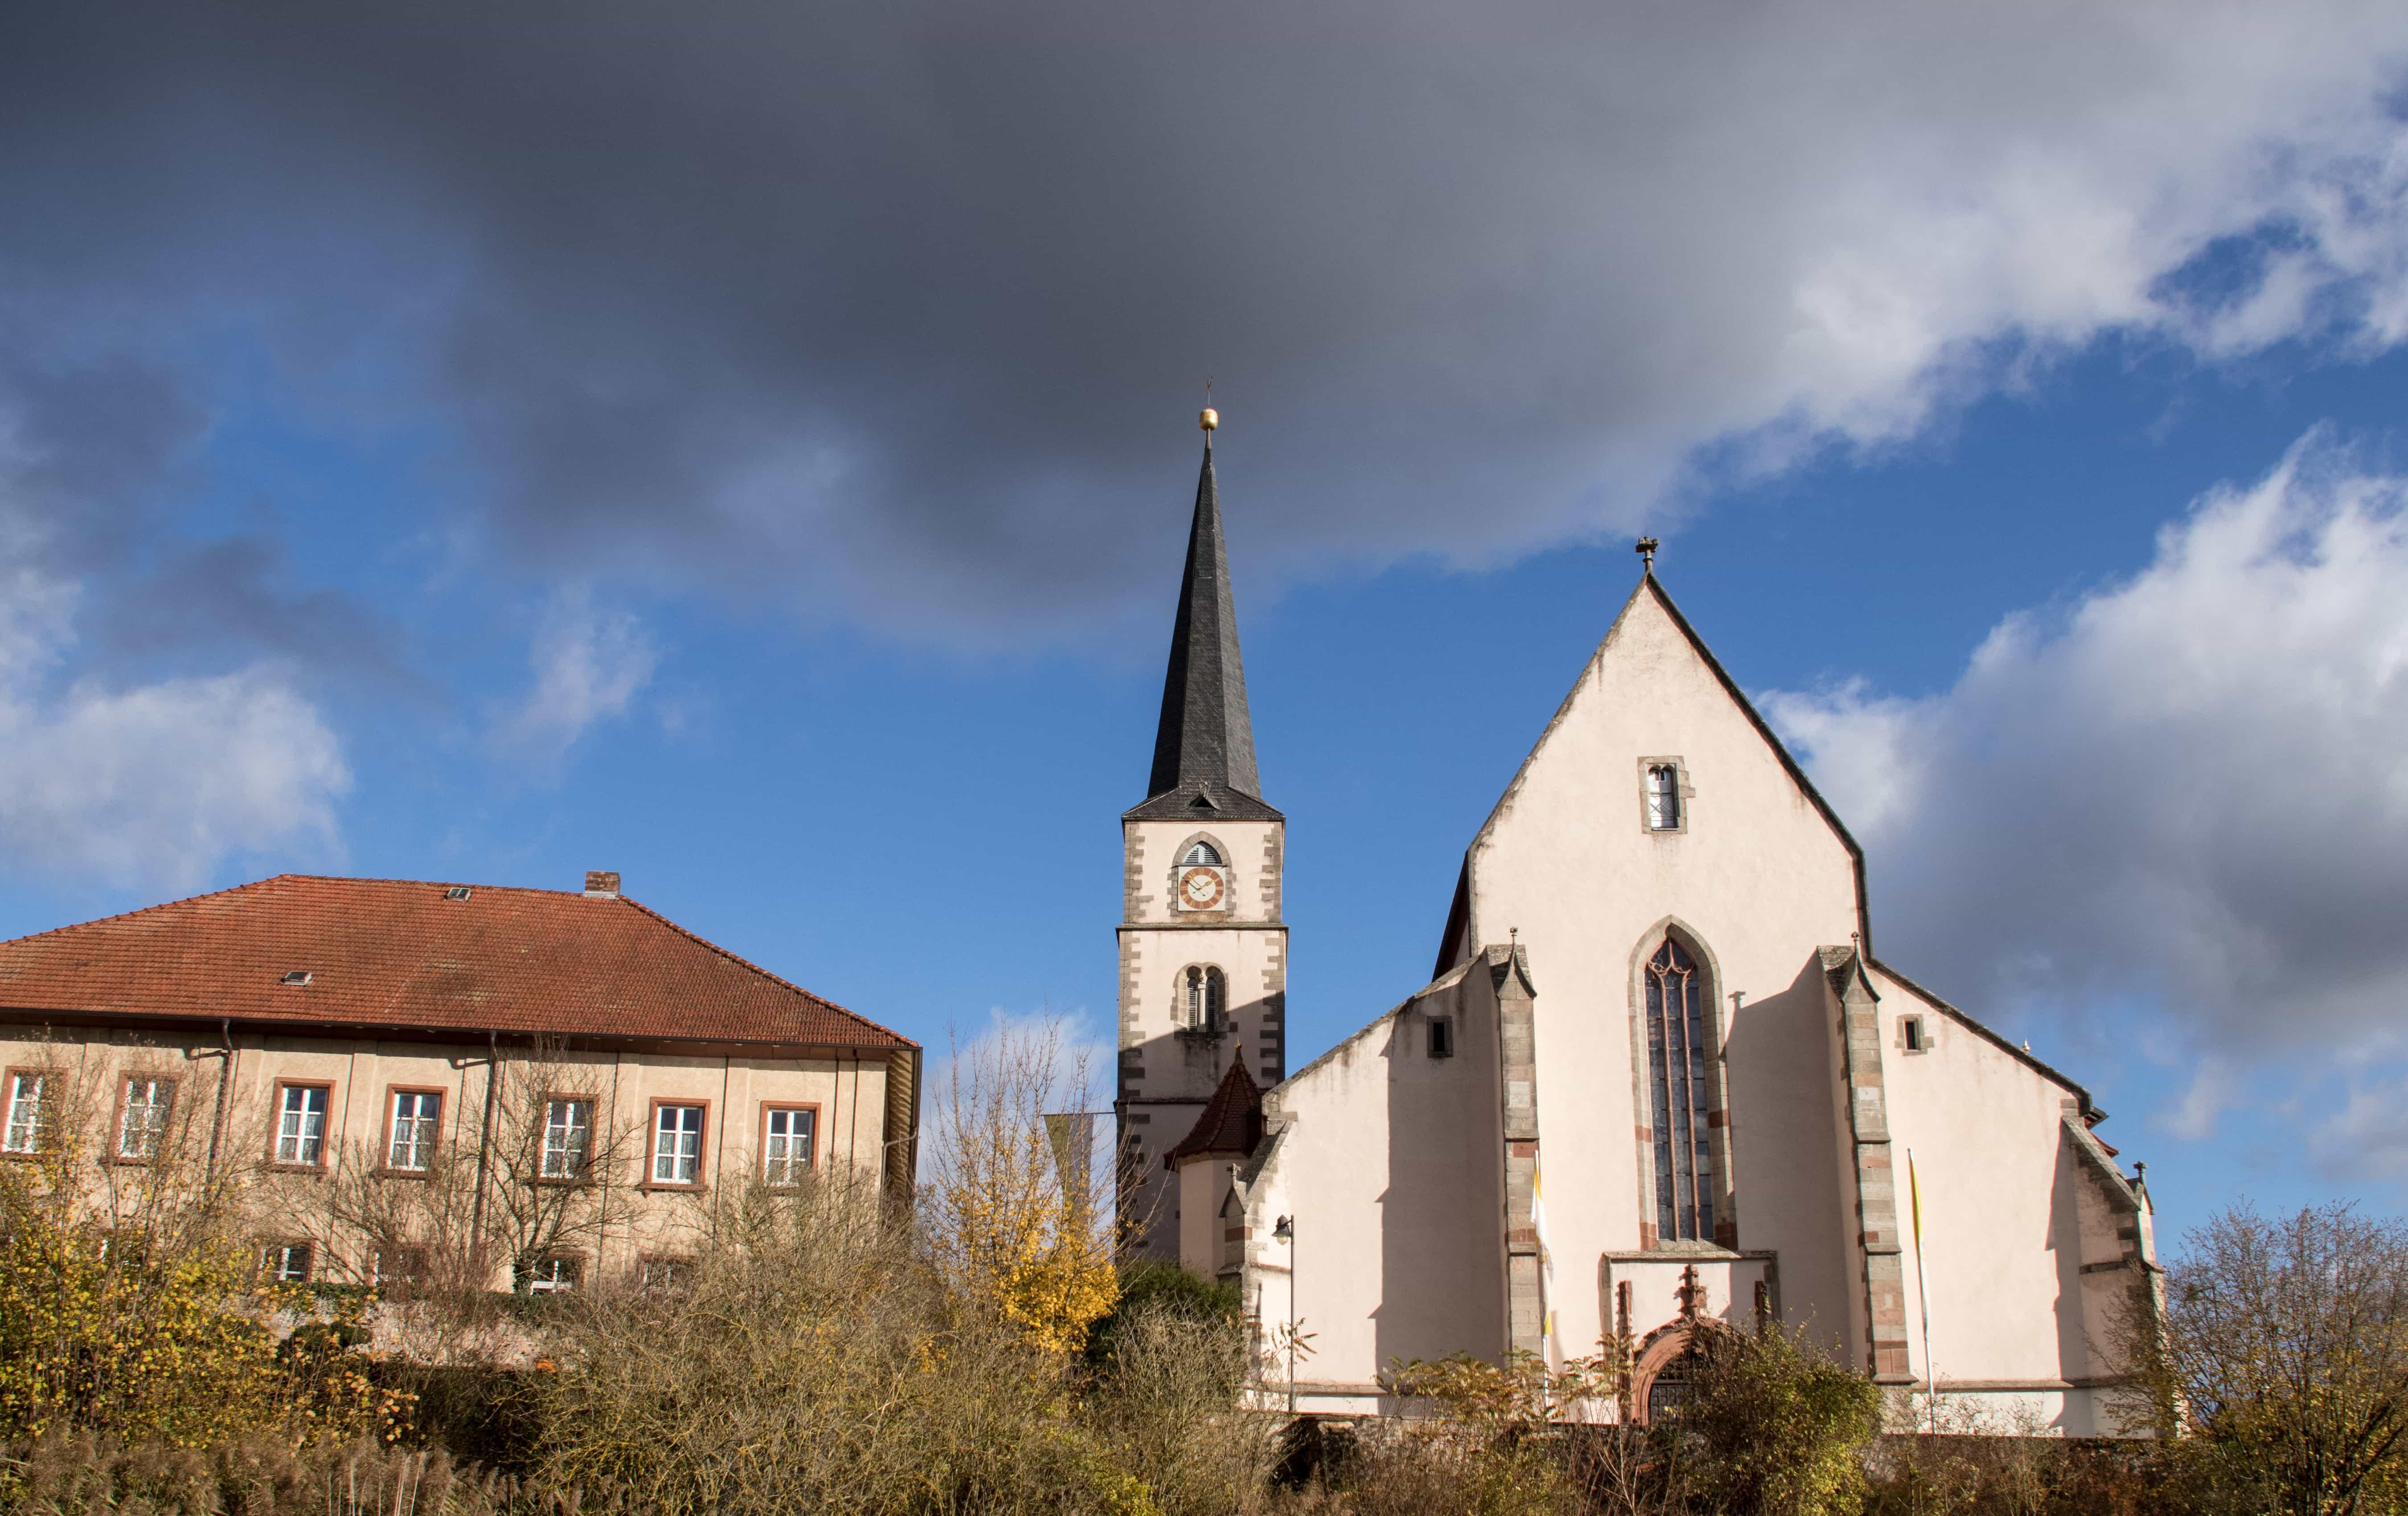 Kirche in Hammelburg - Objektiv: SIgma 18-300 mm